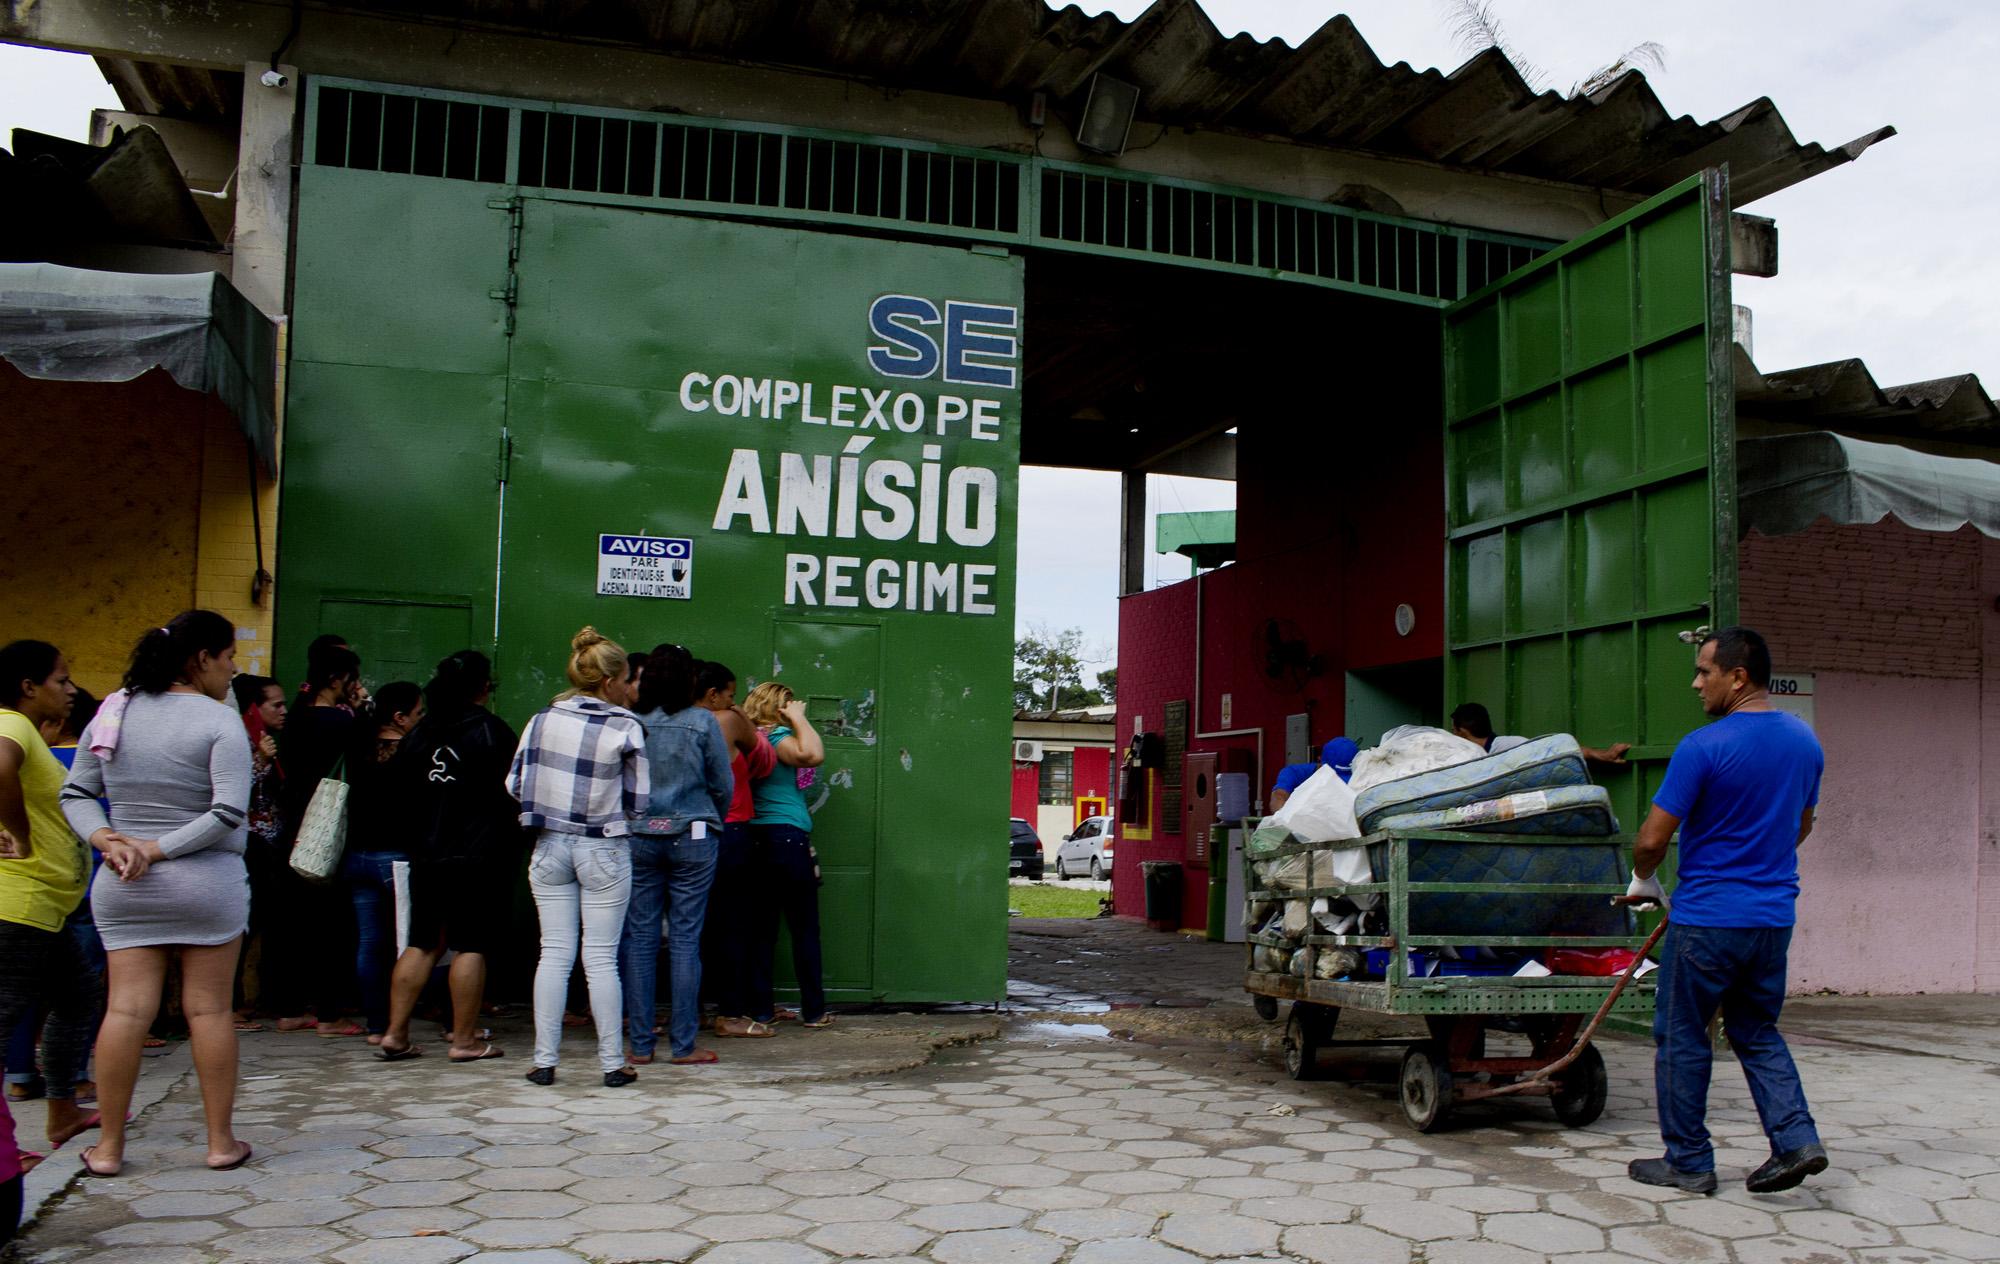 O crime organizado na Amazônia